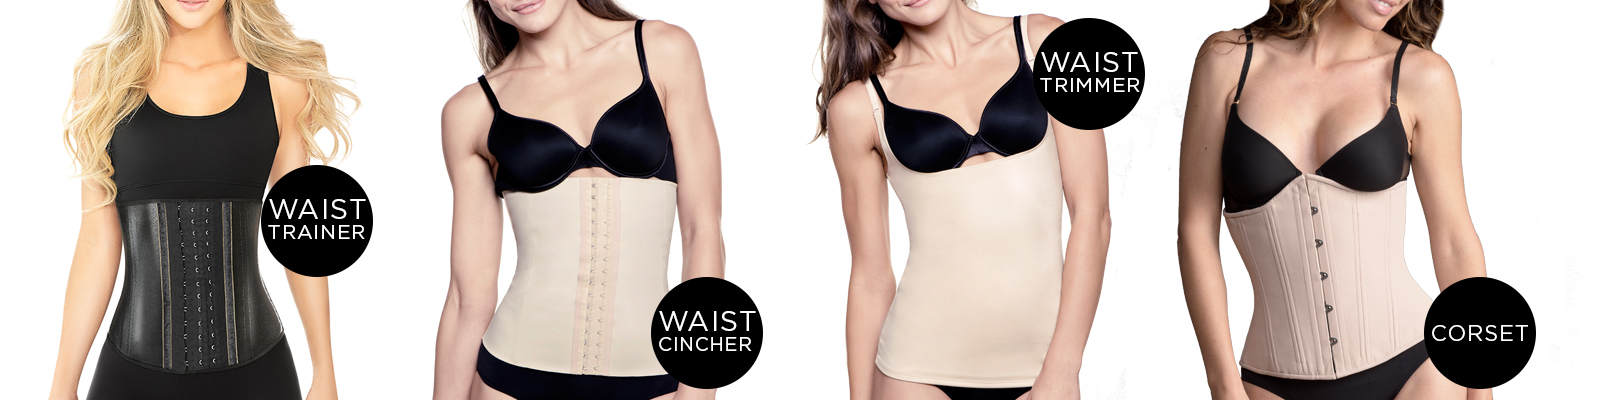 Understanding waist trainers and waist-slimming shapewear